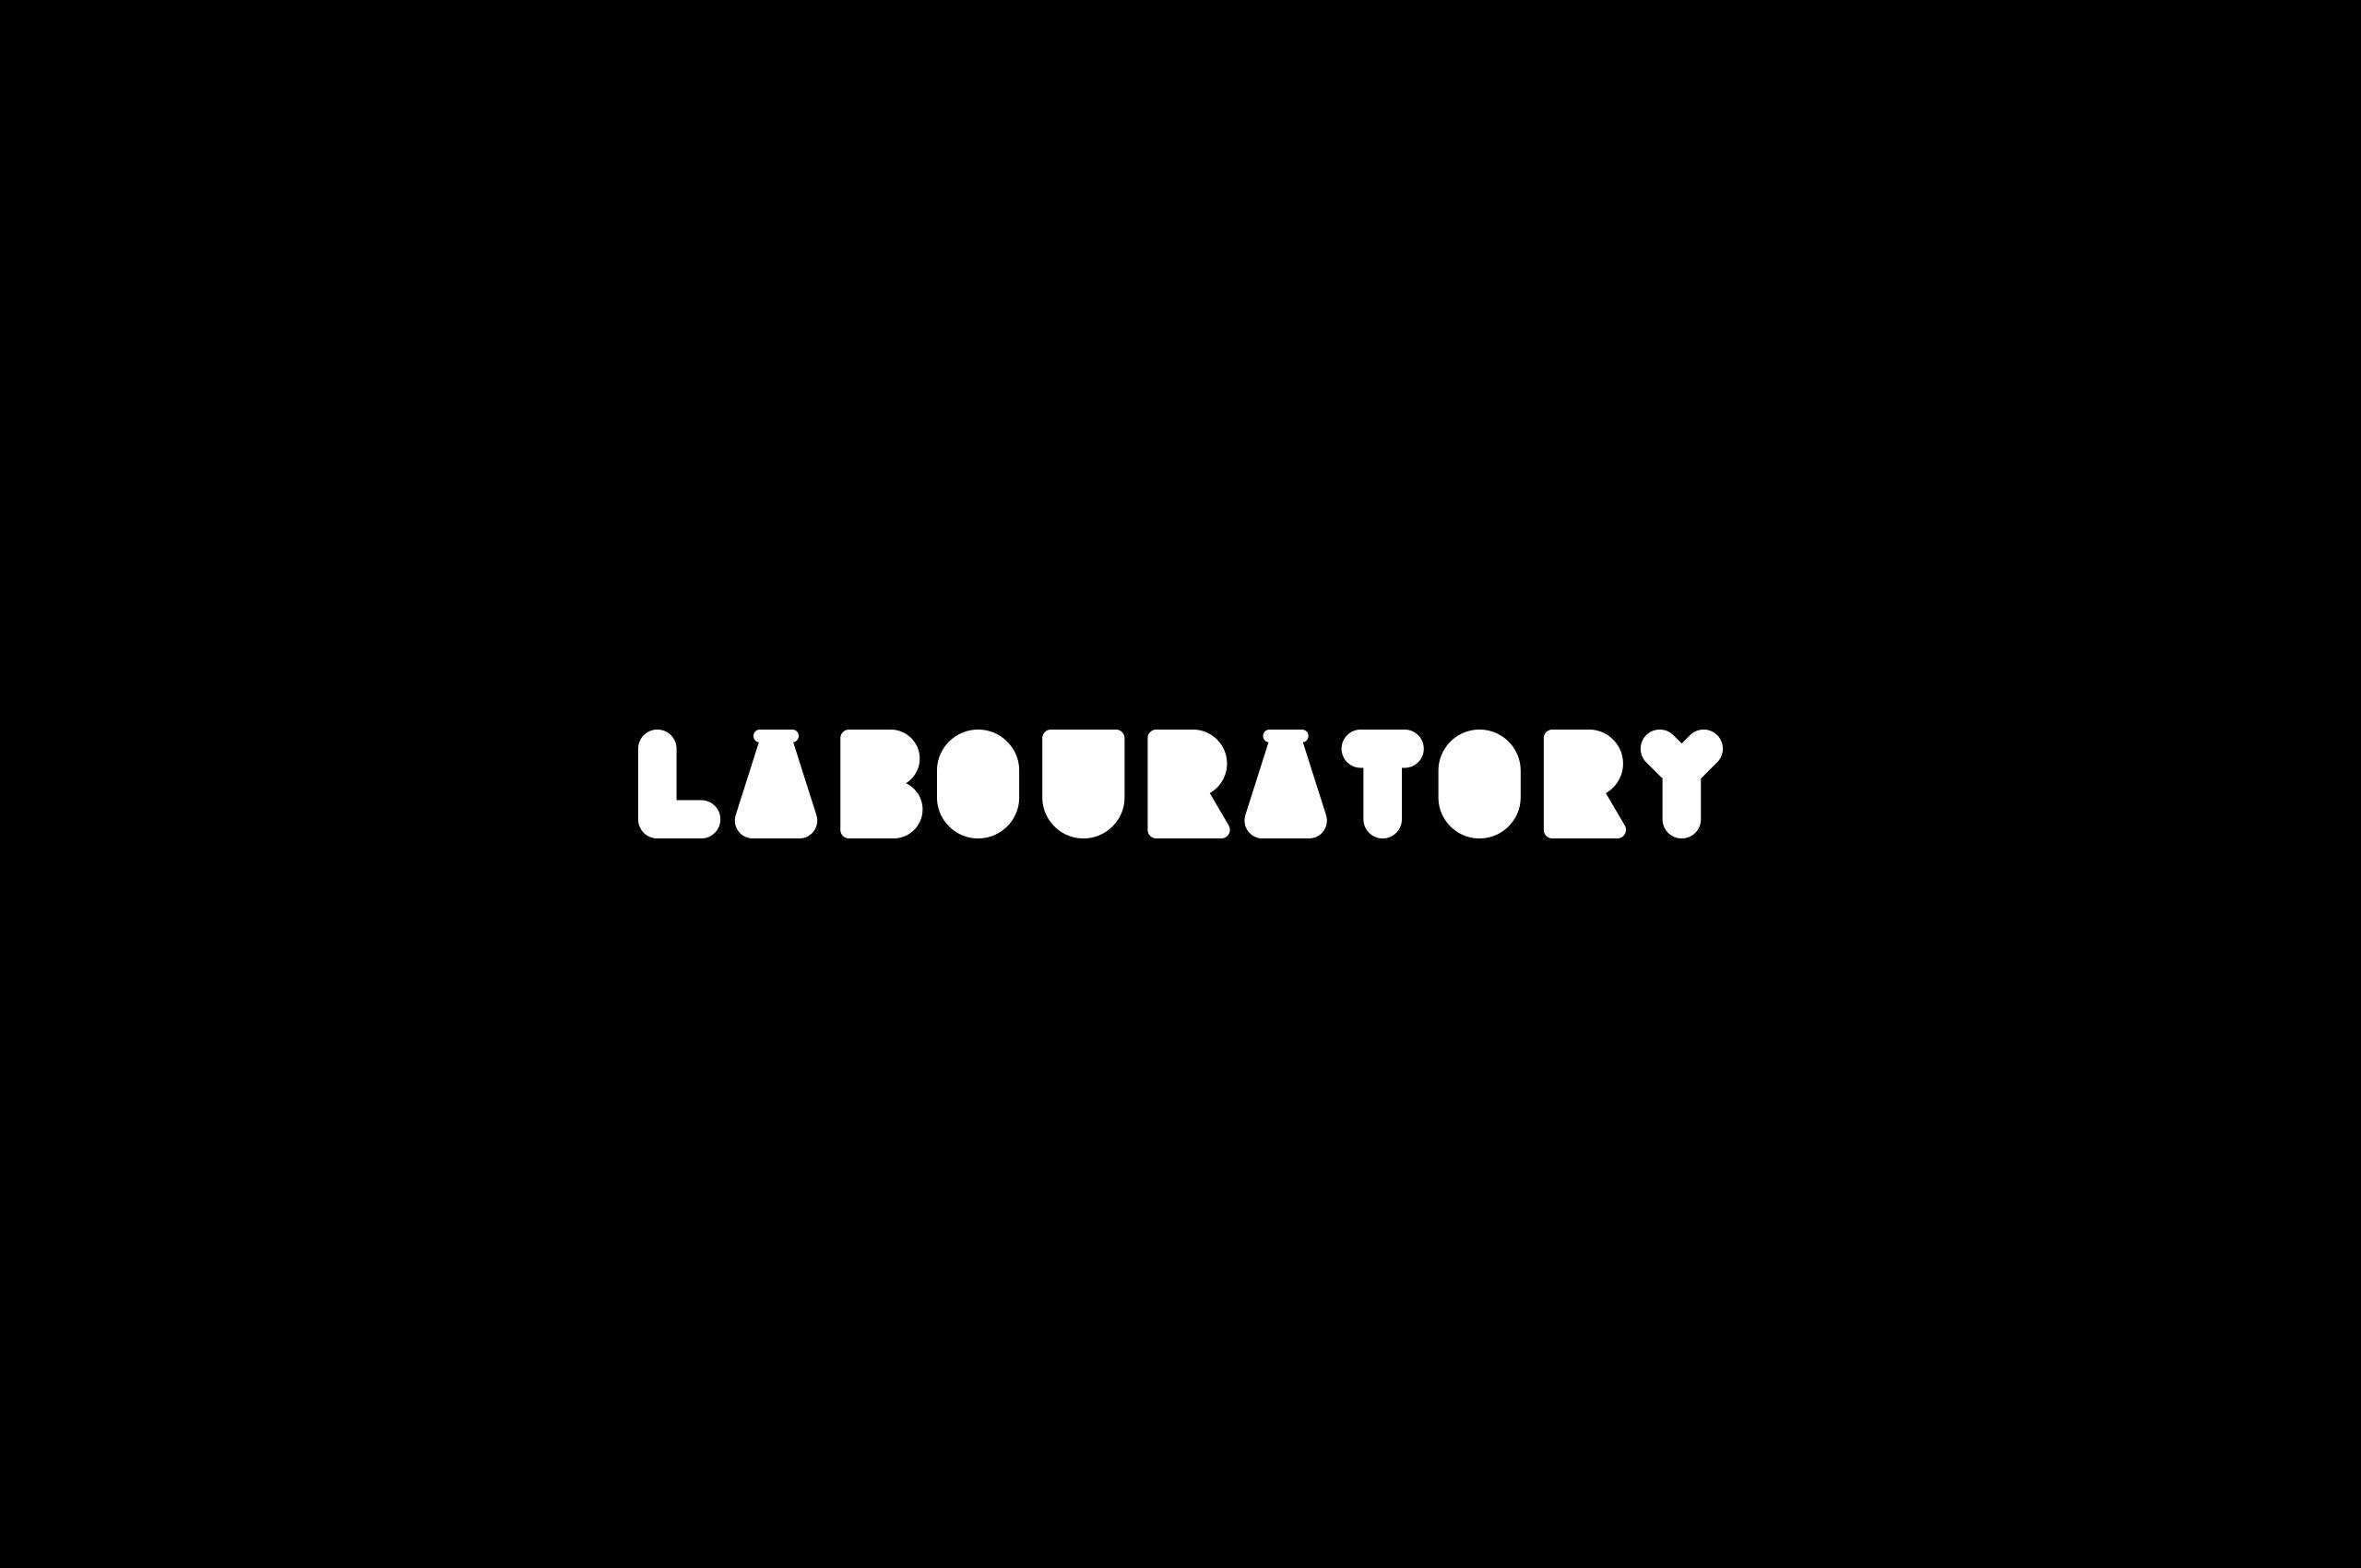 logo-4-black